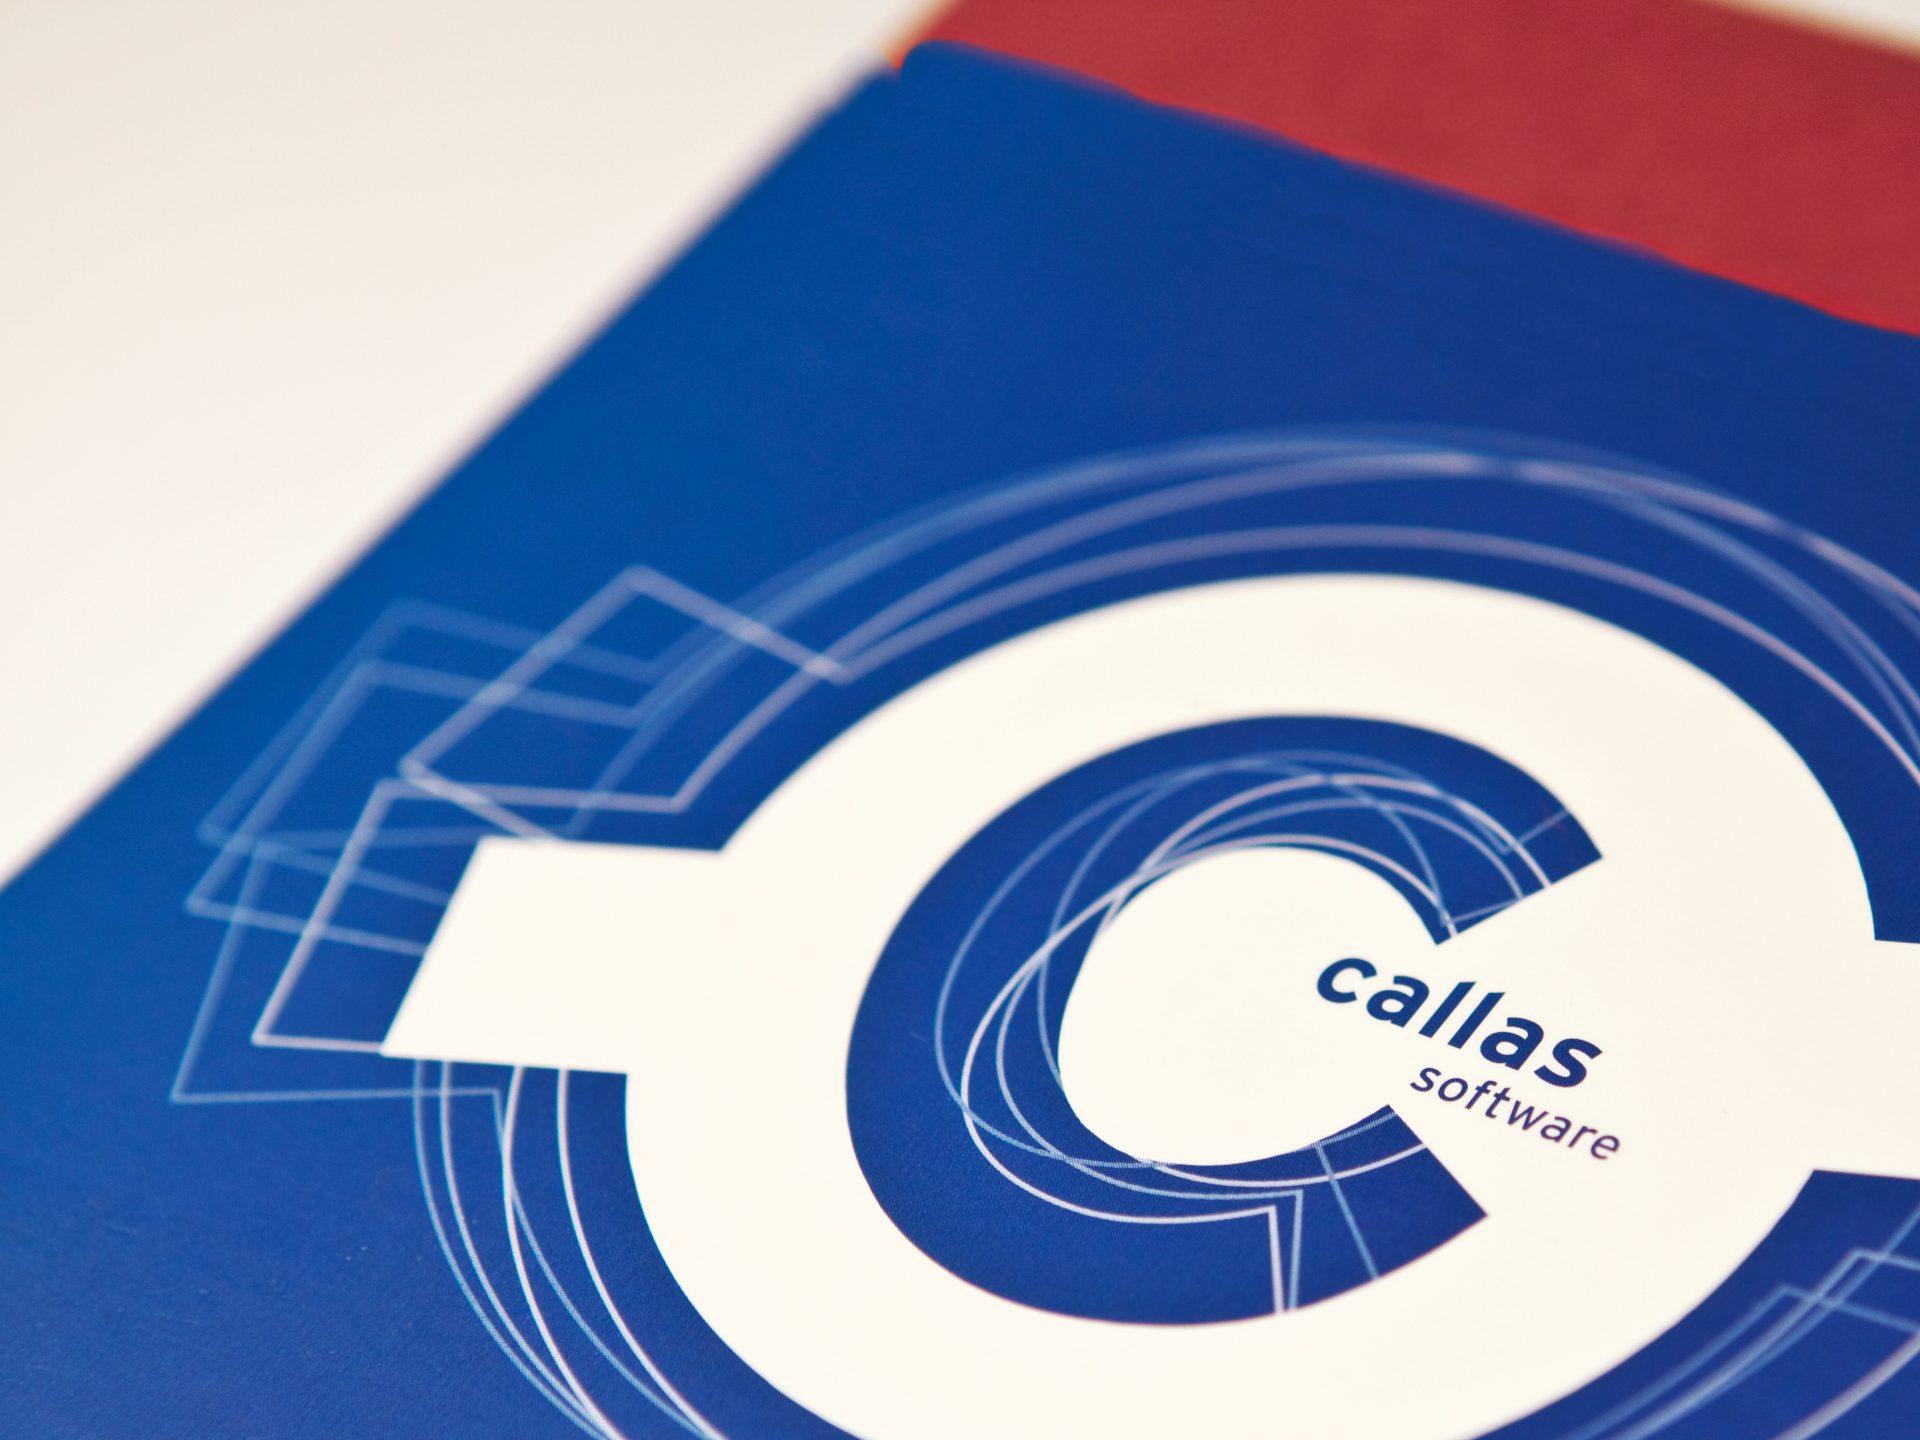 corporatedesign-callas-2-copyright-typoly